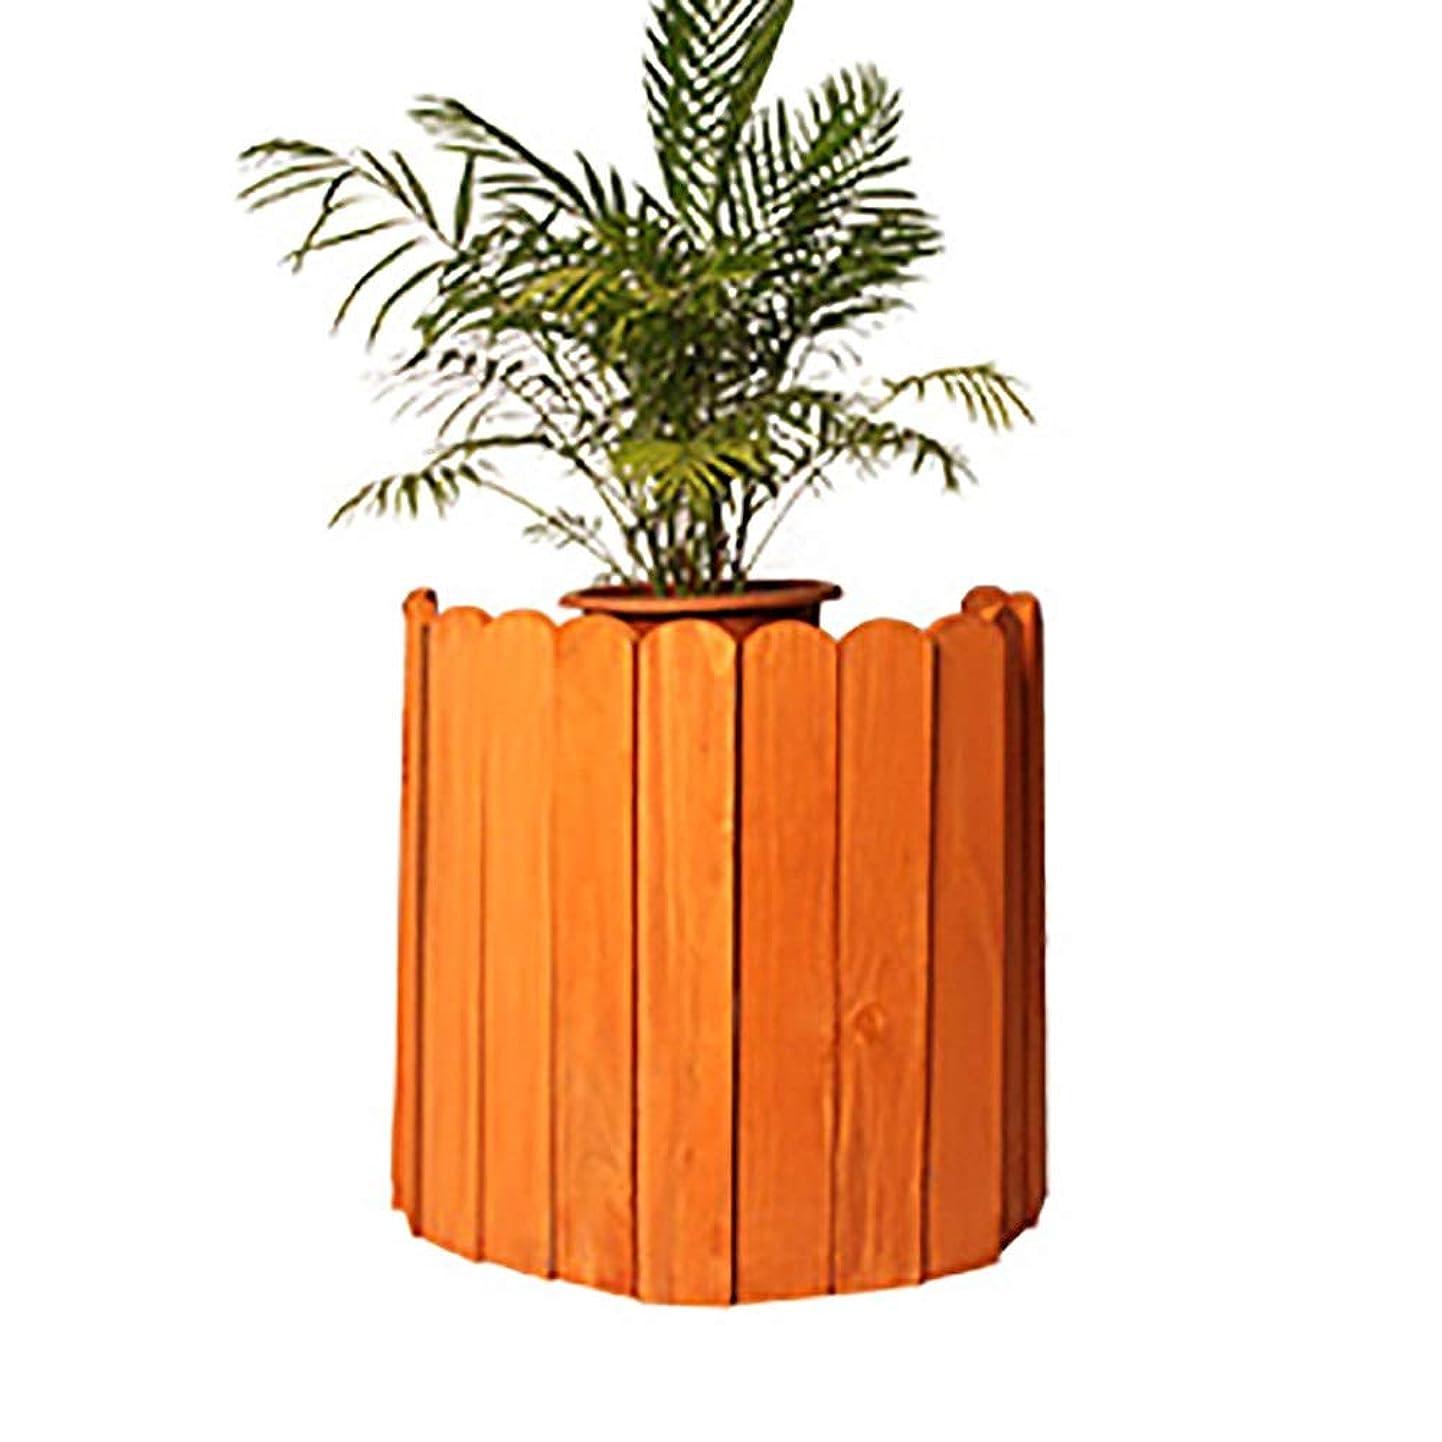 SUBBYE 大型木製ピケットフェンシングパネル-ガーデンフェンス国境インスタントフェンスカントリーコーナーガーデン作品、オレンジ、長さ39インチ、5サイズ (Color : 100×40cm)